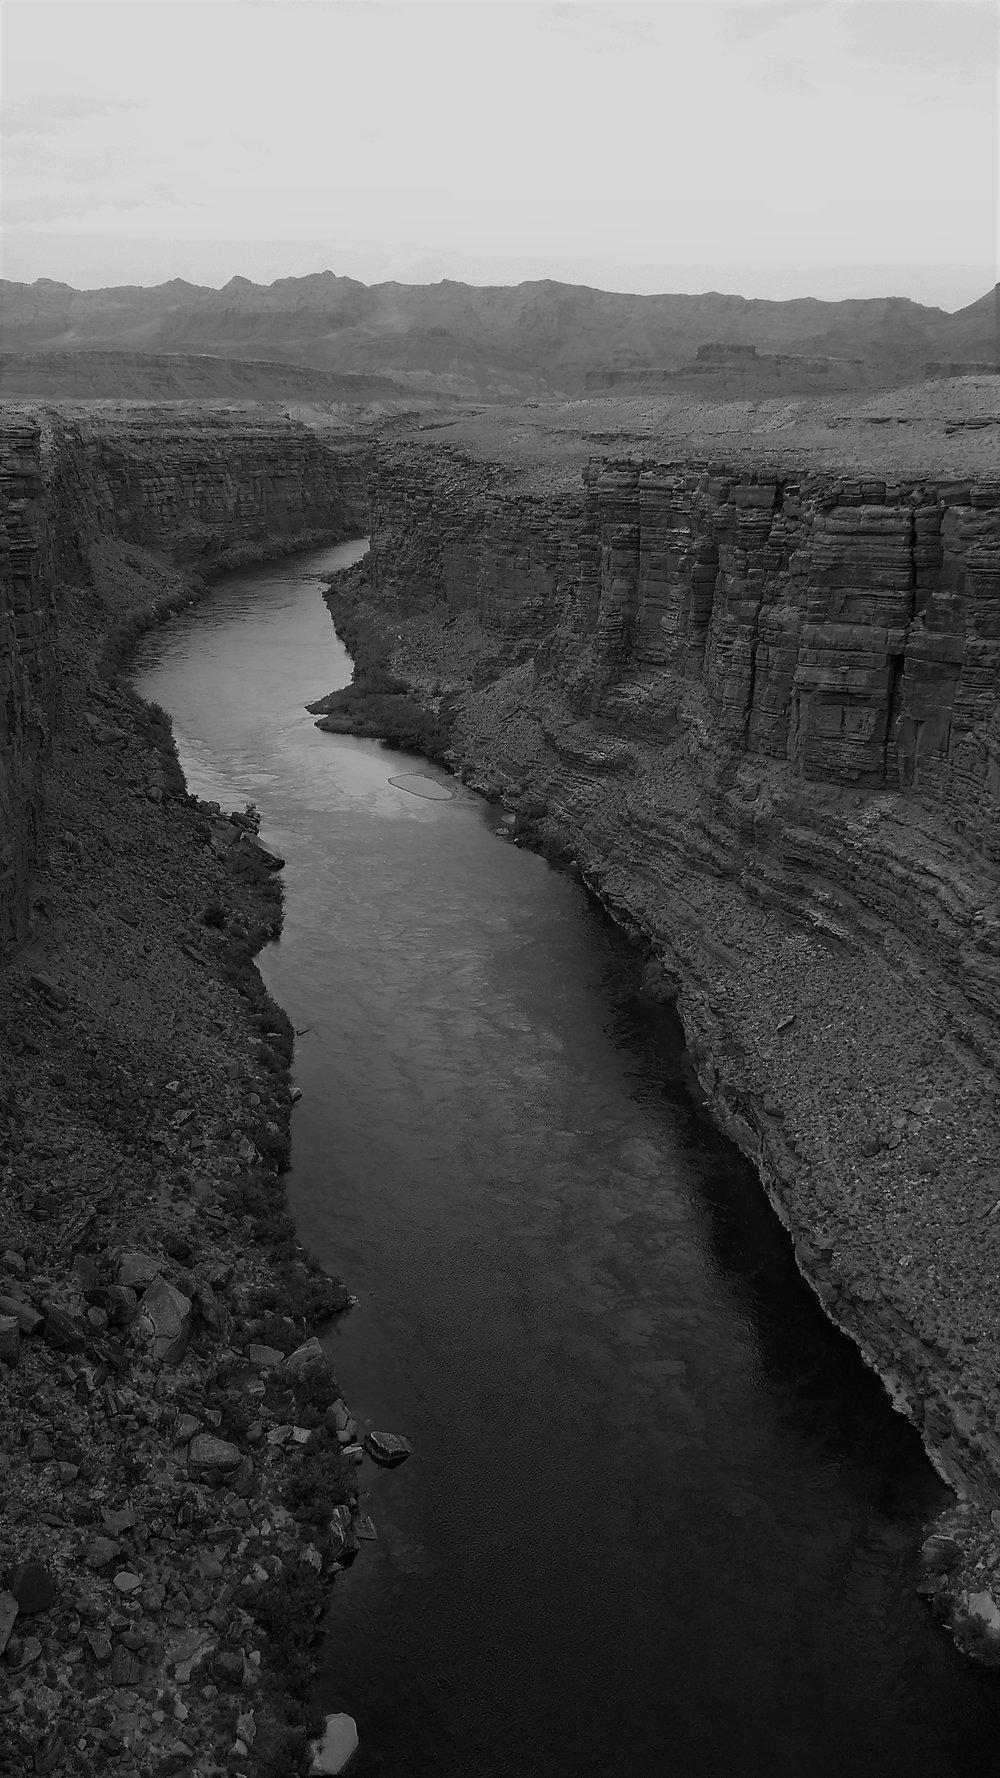 Colorado_River_Credit_Matt_Clark.jpg